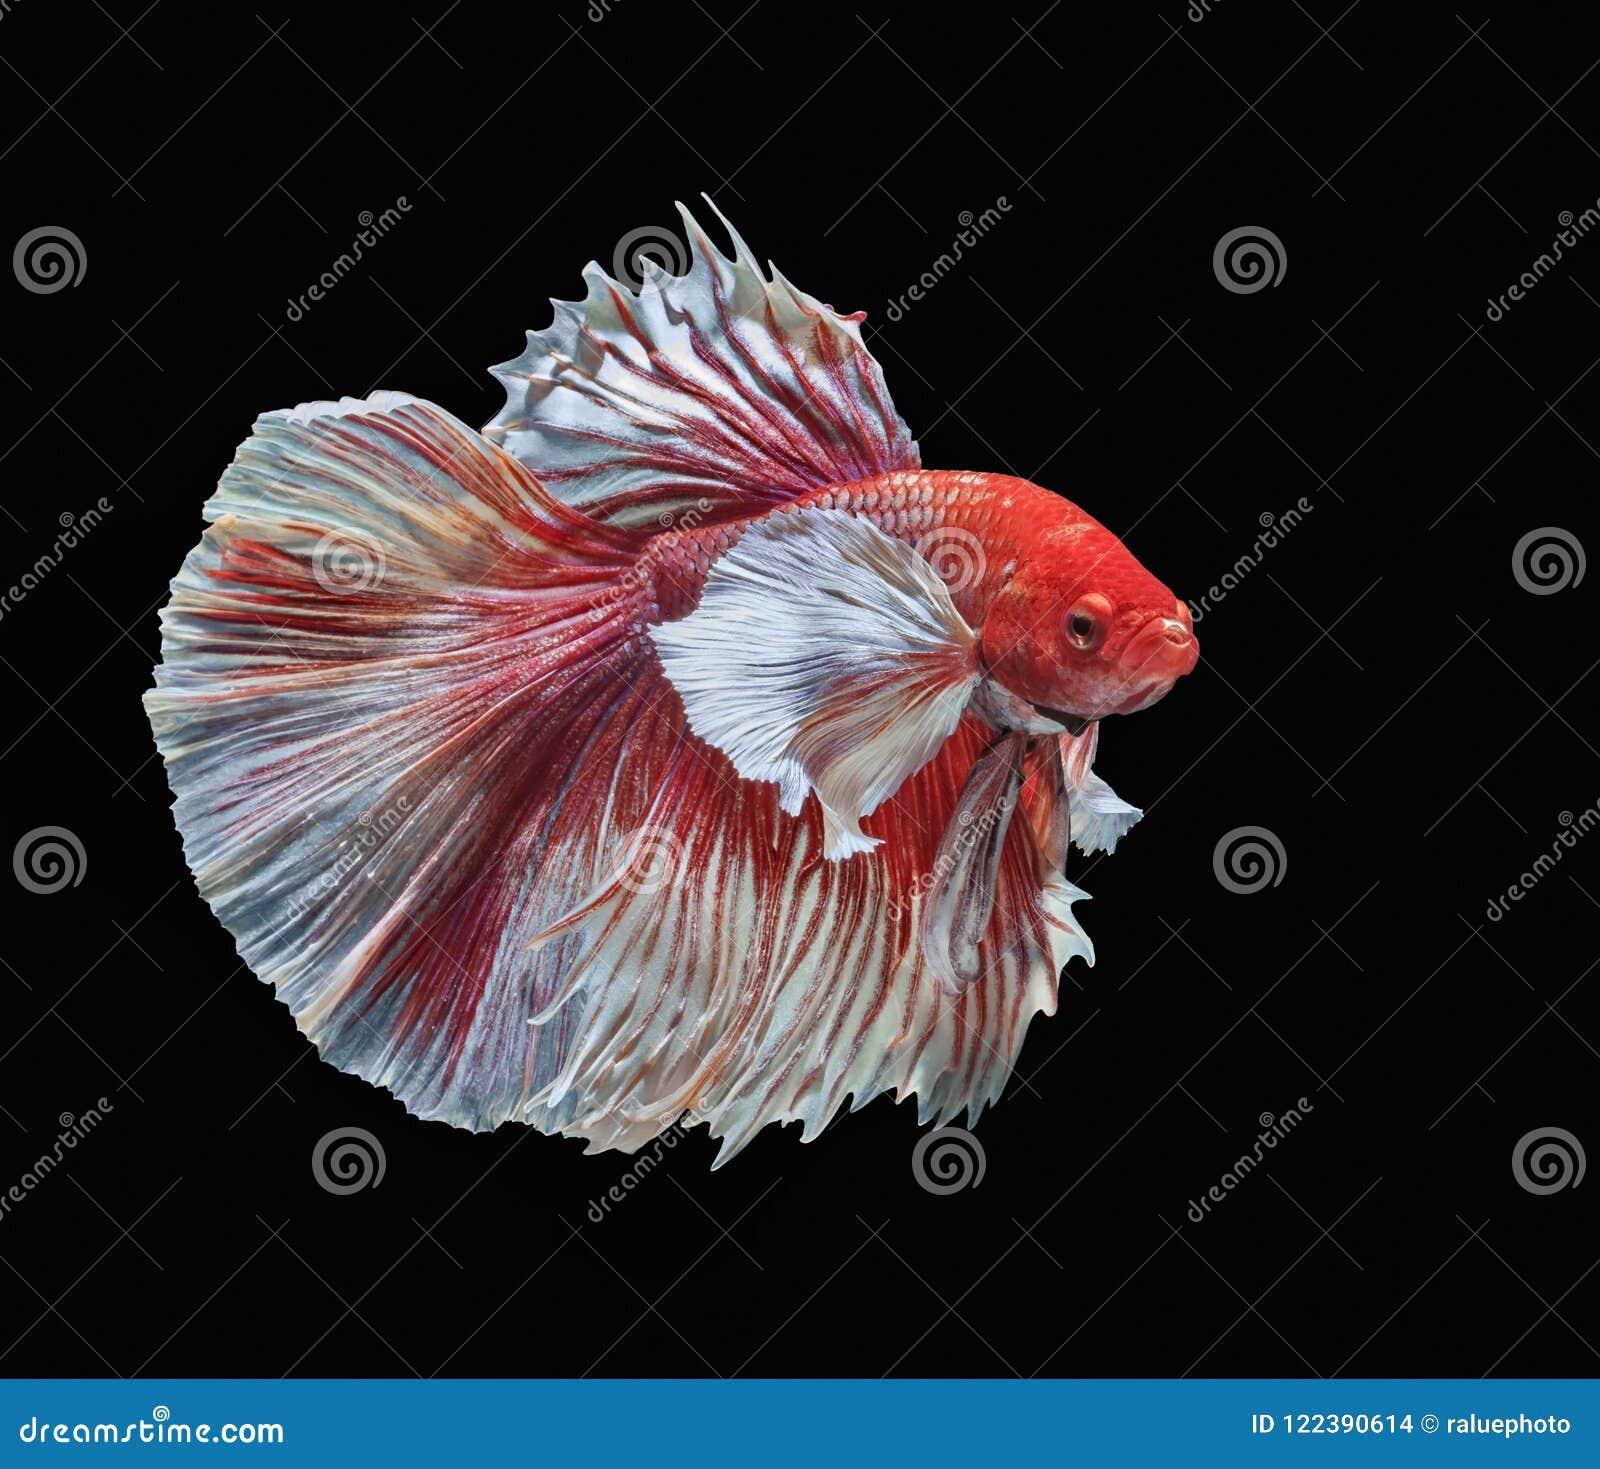 Fish Fighting, Beautiful Fish, Colorful Fish Fighting Siam, Colorful ...